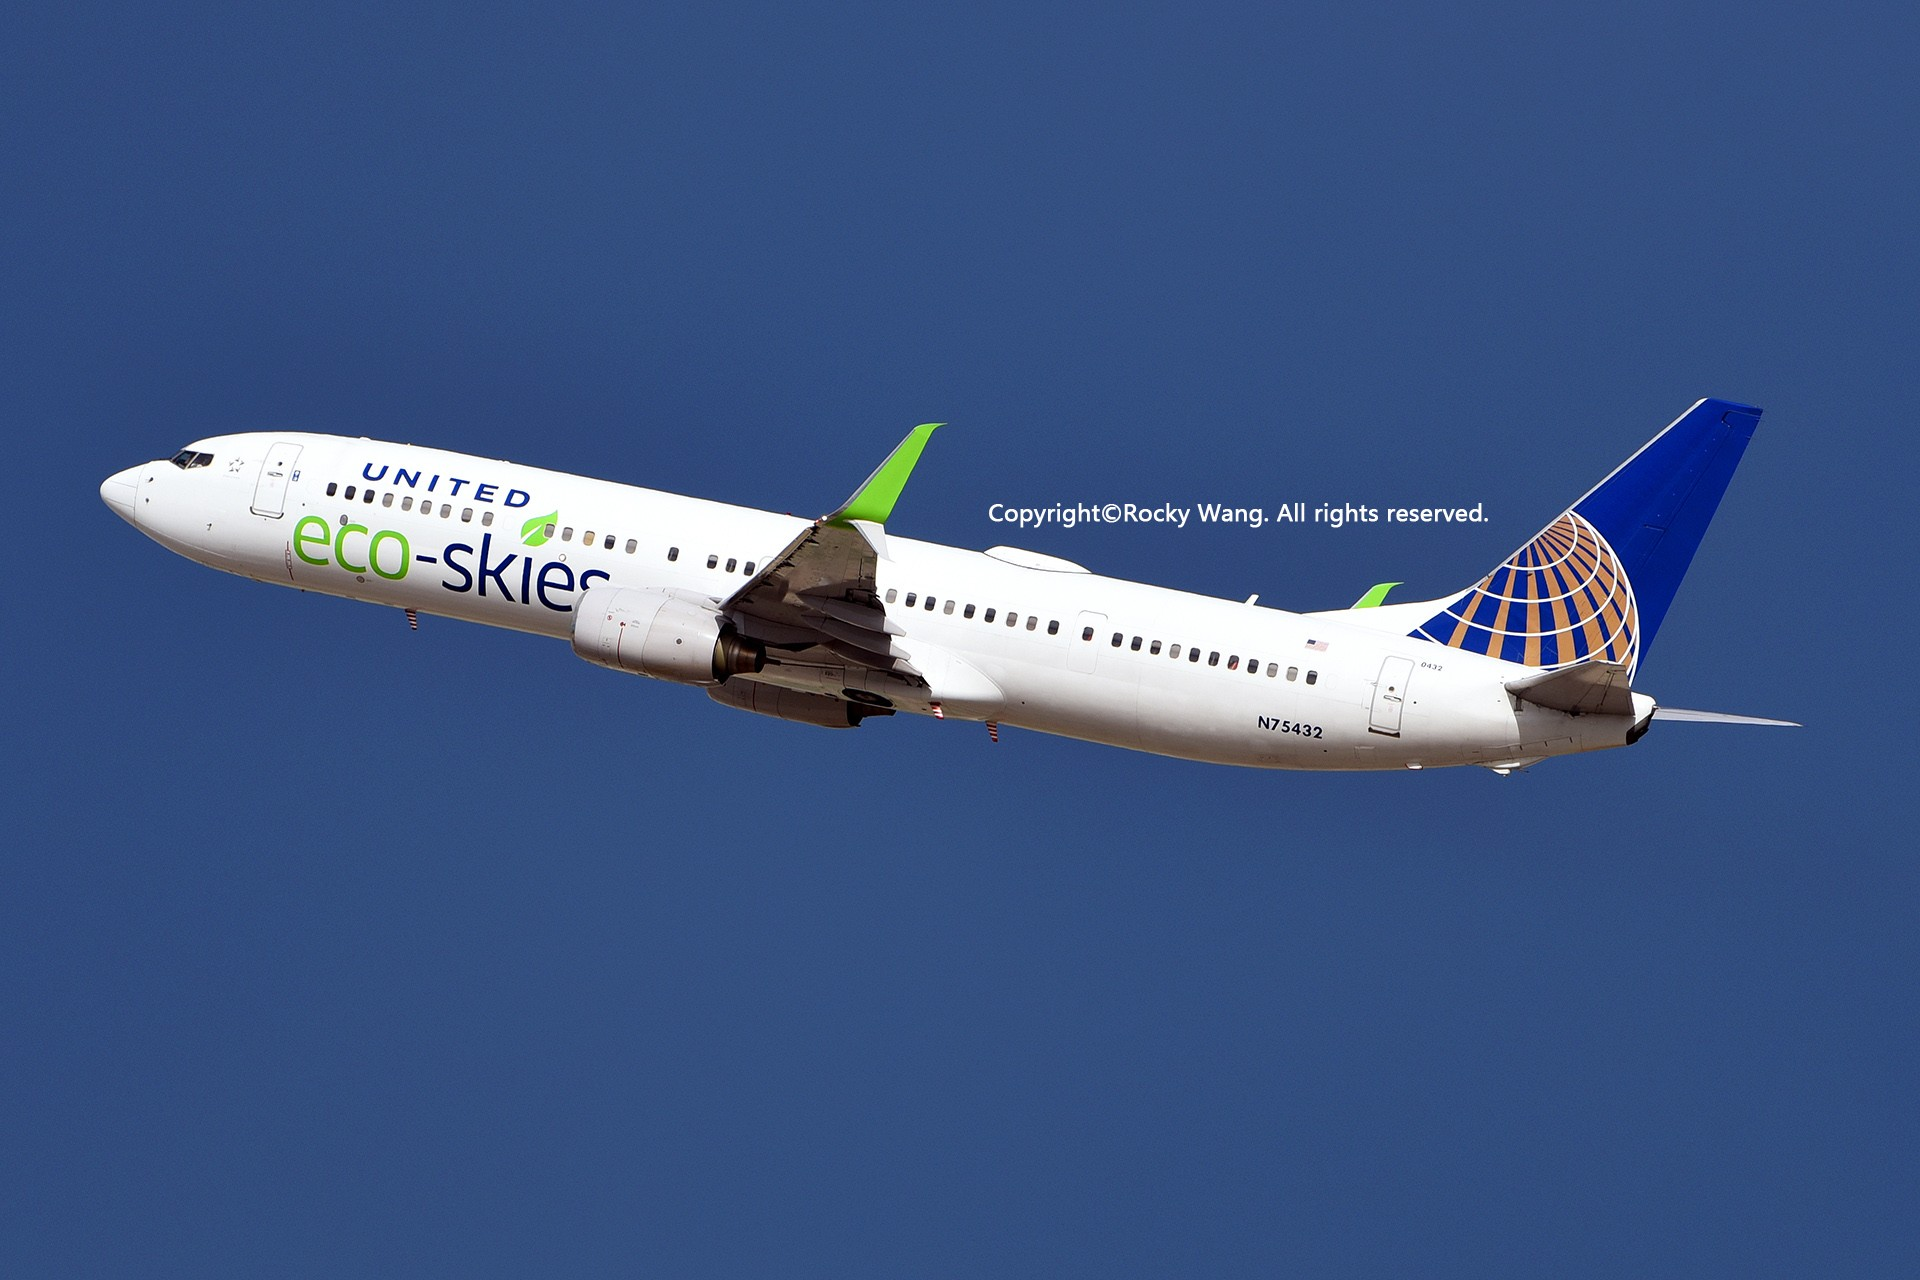 Re:[原创]彩绘圣地-附加彩蛋 BOEING 737-924ER N75432 Los Angeles Int'l Airport